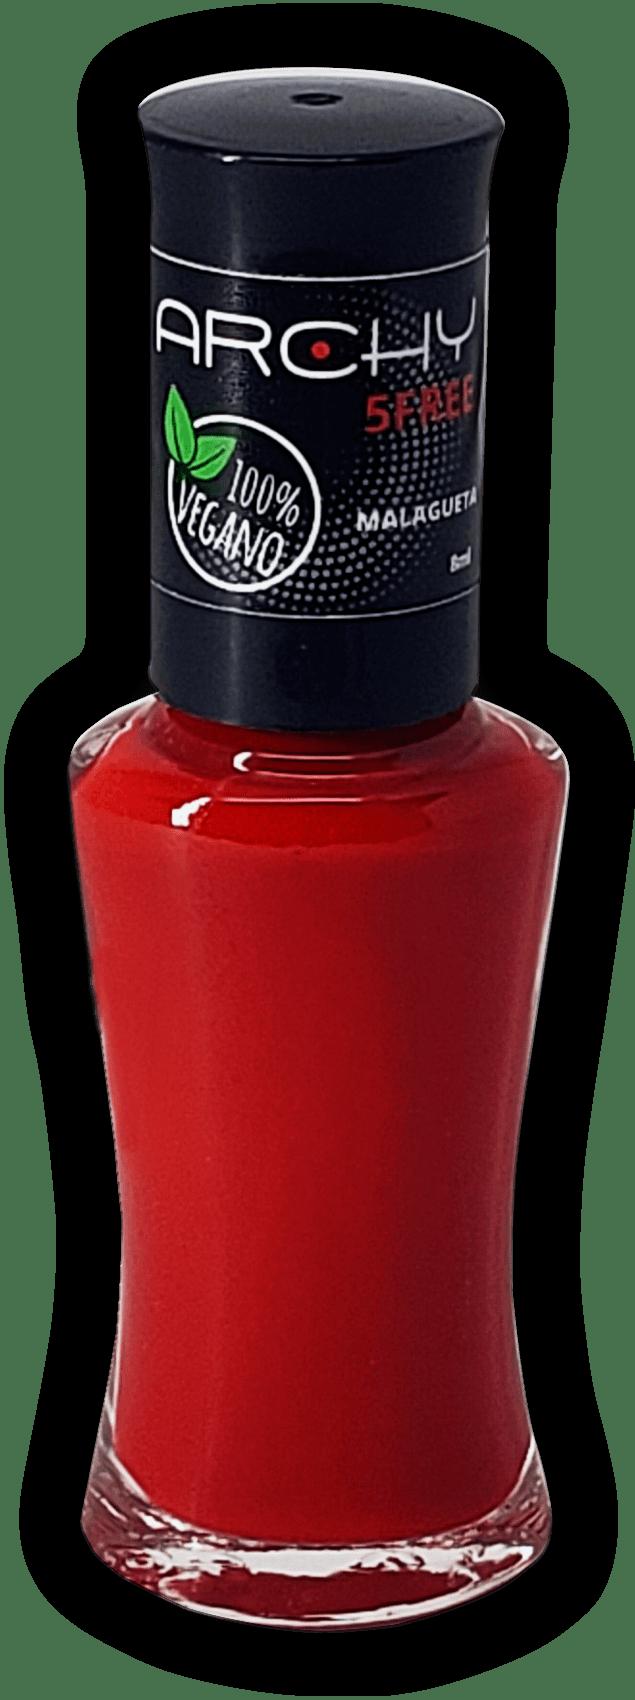 Esmalte Vegano 5 Free Malagueta - Archy Make Up